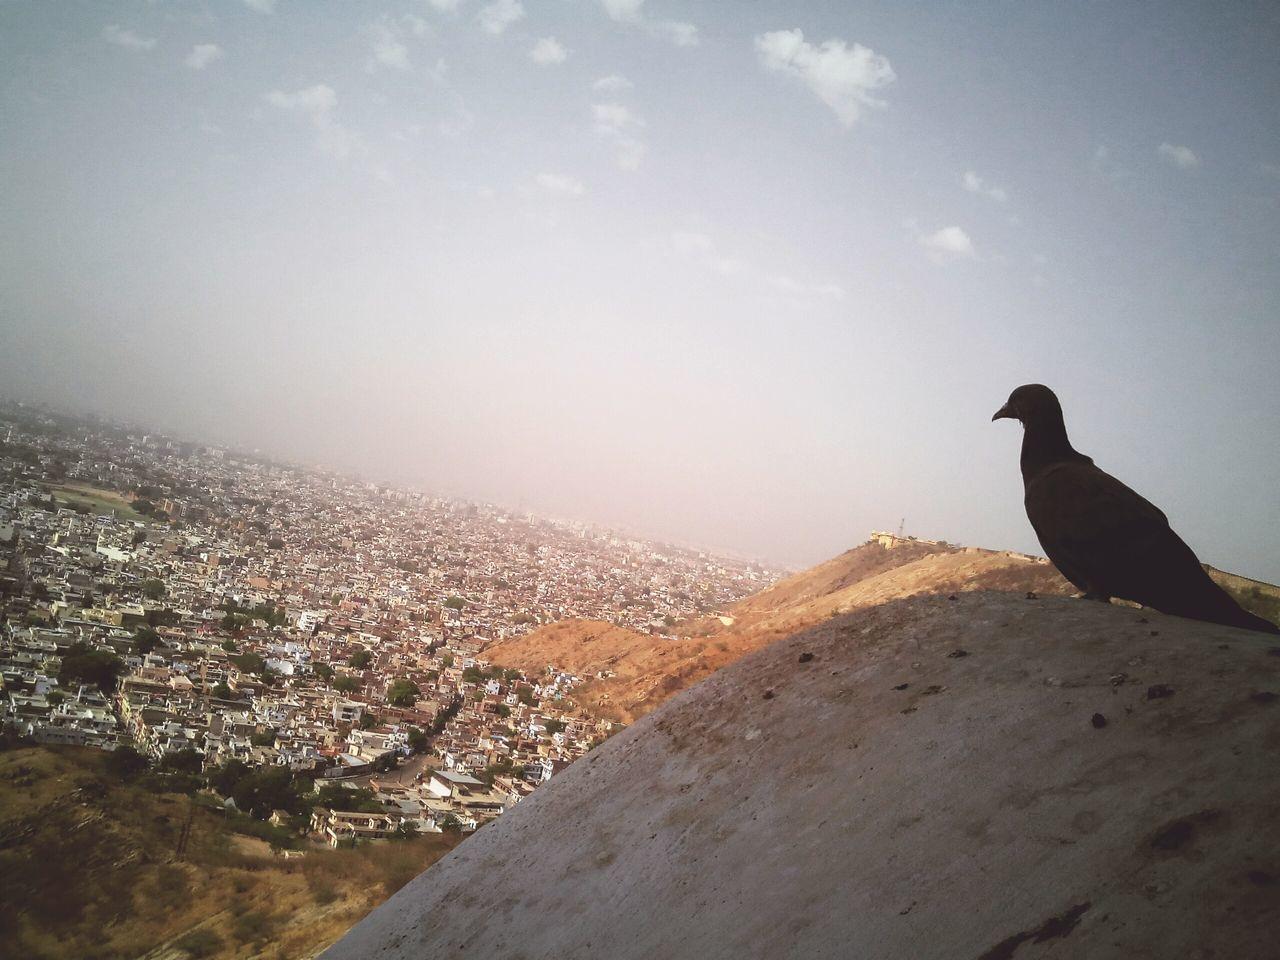 Thoughtful pigeon! Pegion Bird Height City View Cityscape City View  Thoughtful Thoughtfulbird Jaipur Rajasthan Jaipurdiaries Garh Ganesh Temple HillTopView India Taking Photos Smartphonephotography Lovetotakepics Jaipurtrip Jaipur,India